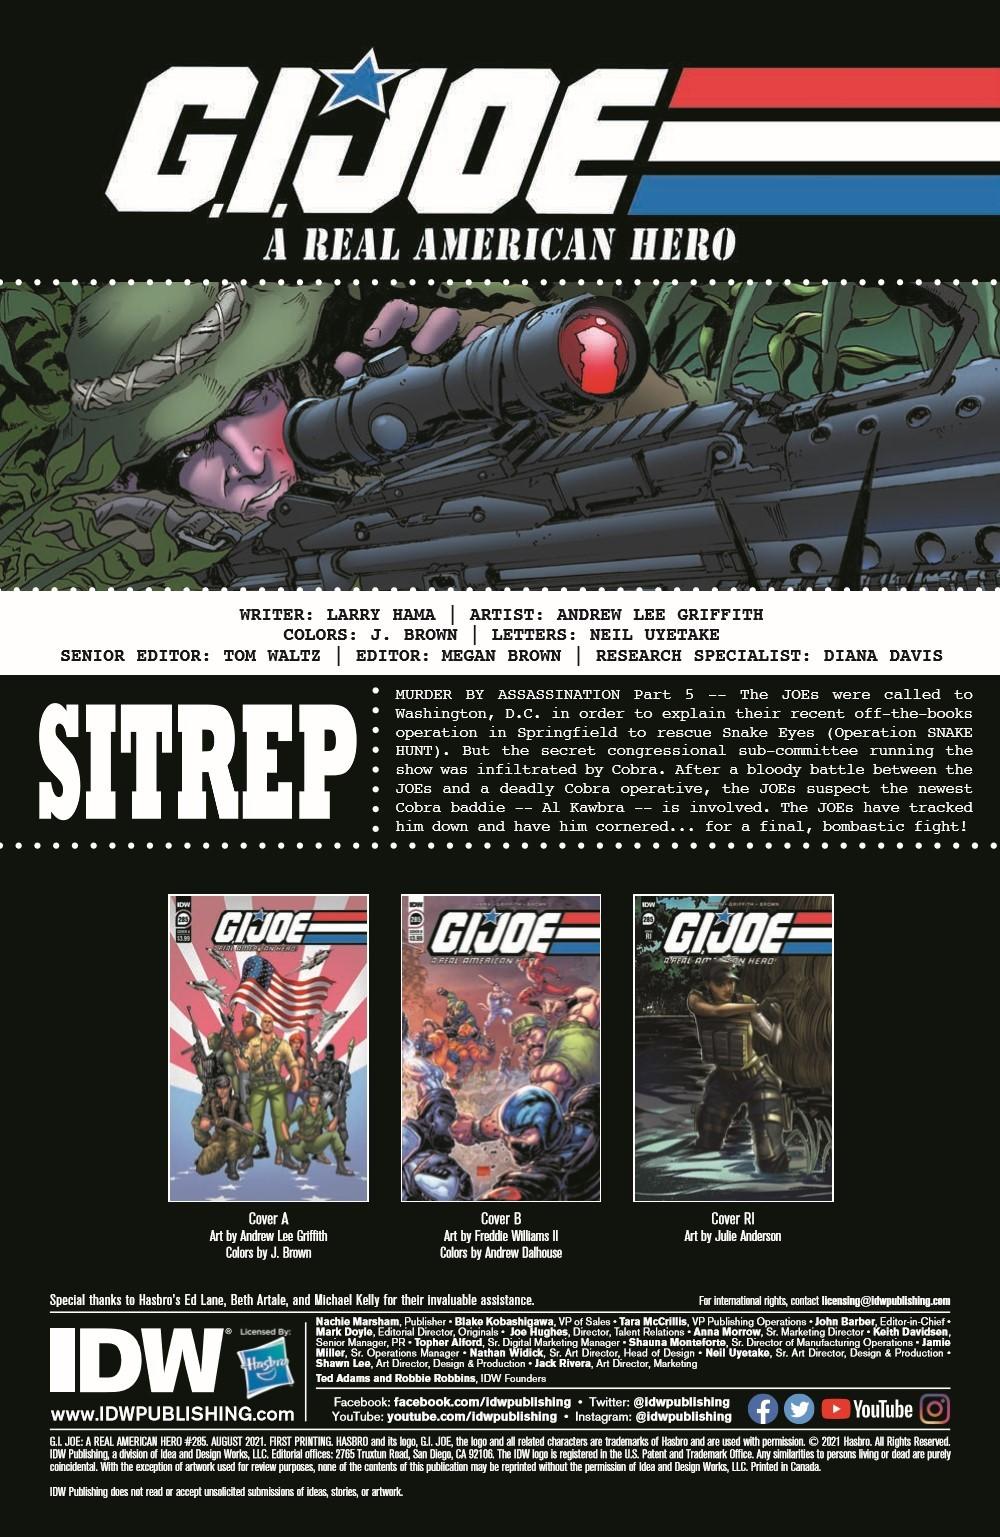 GIJoeRAH285-pr-2 ComicList Previews: G.I. JOE A REAL AMERICAN HERO #285